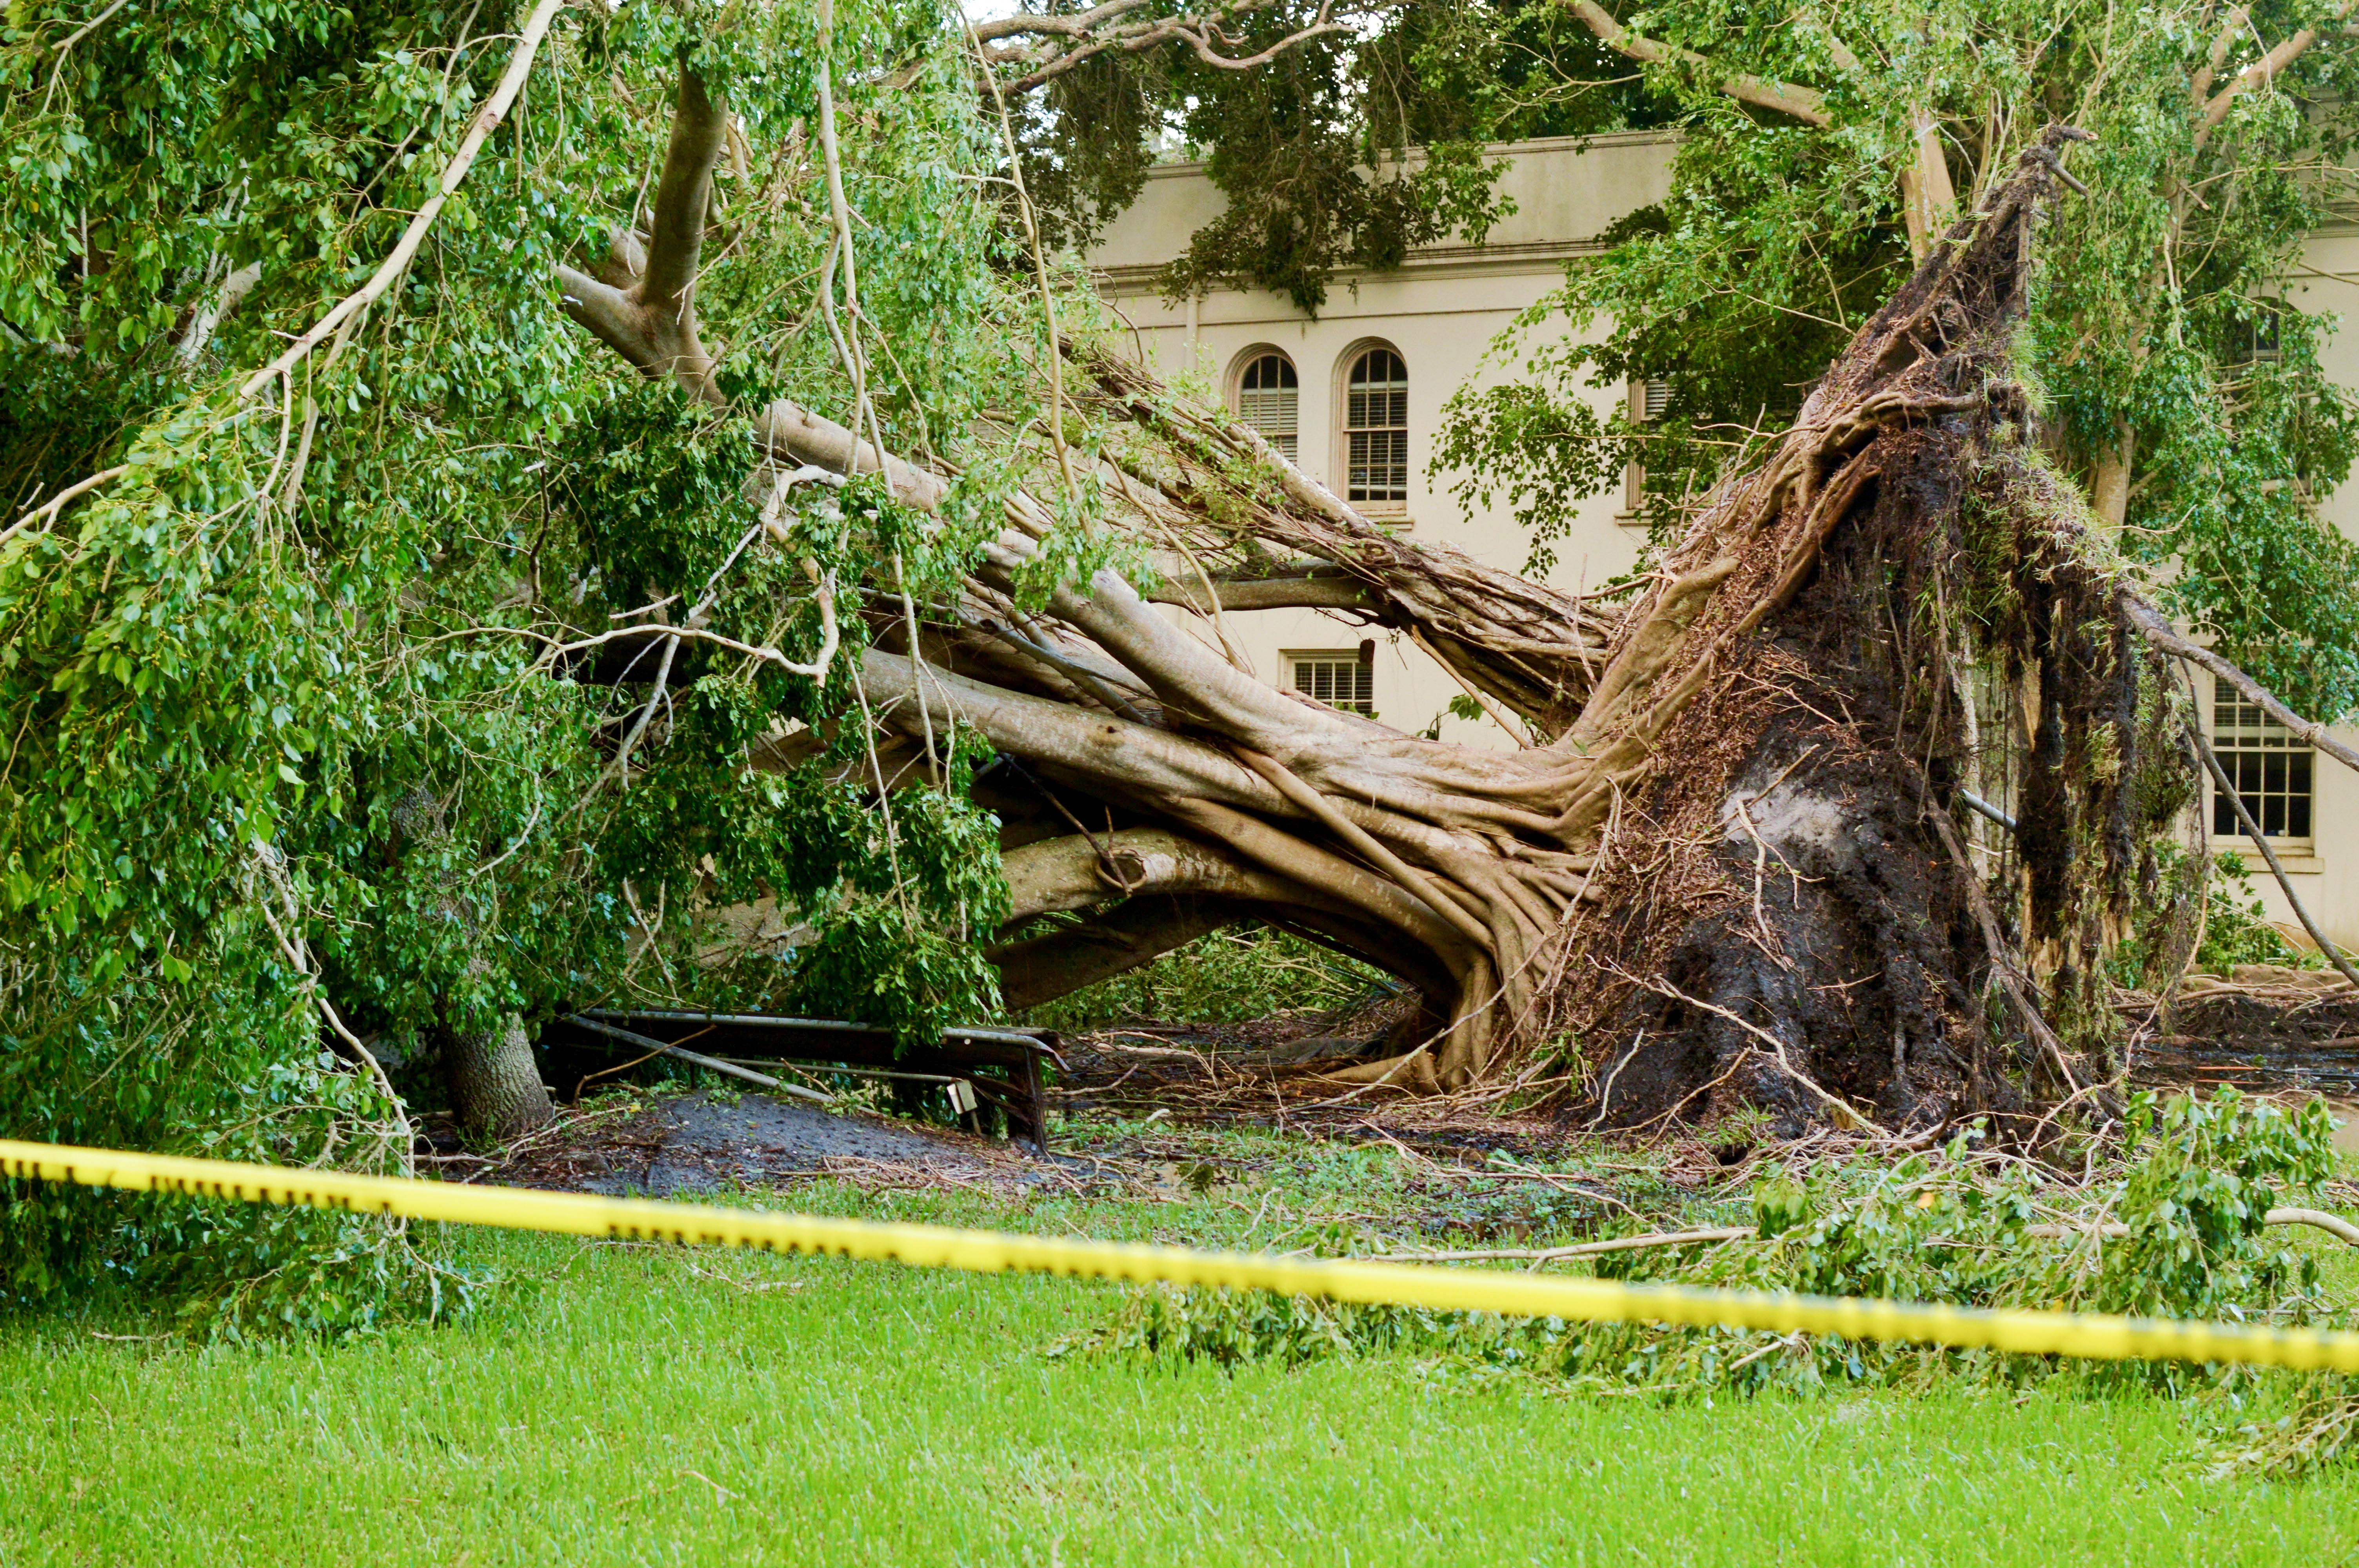 New College survives Hurricane Irma